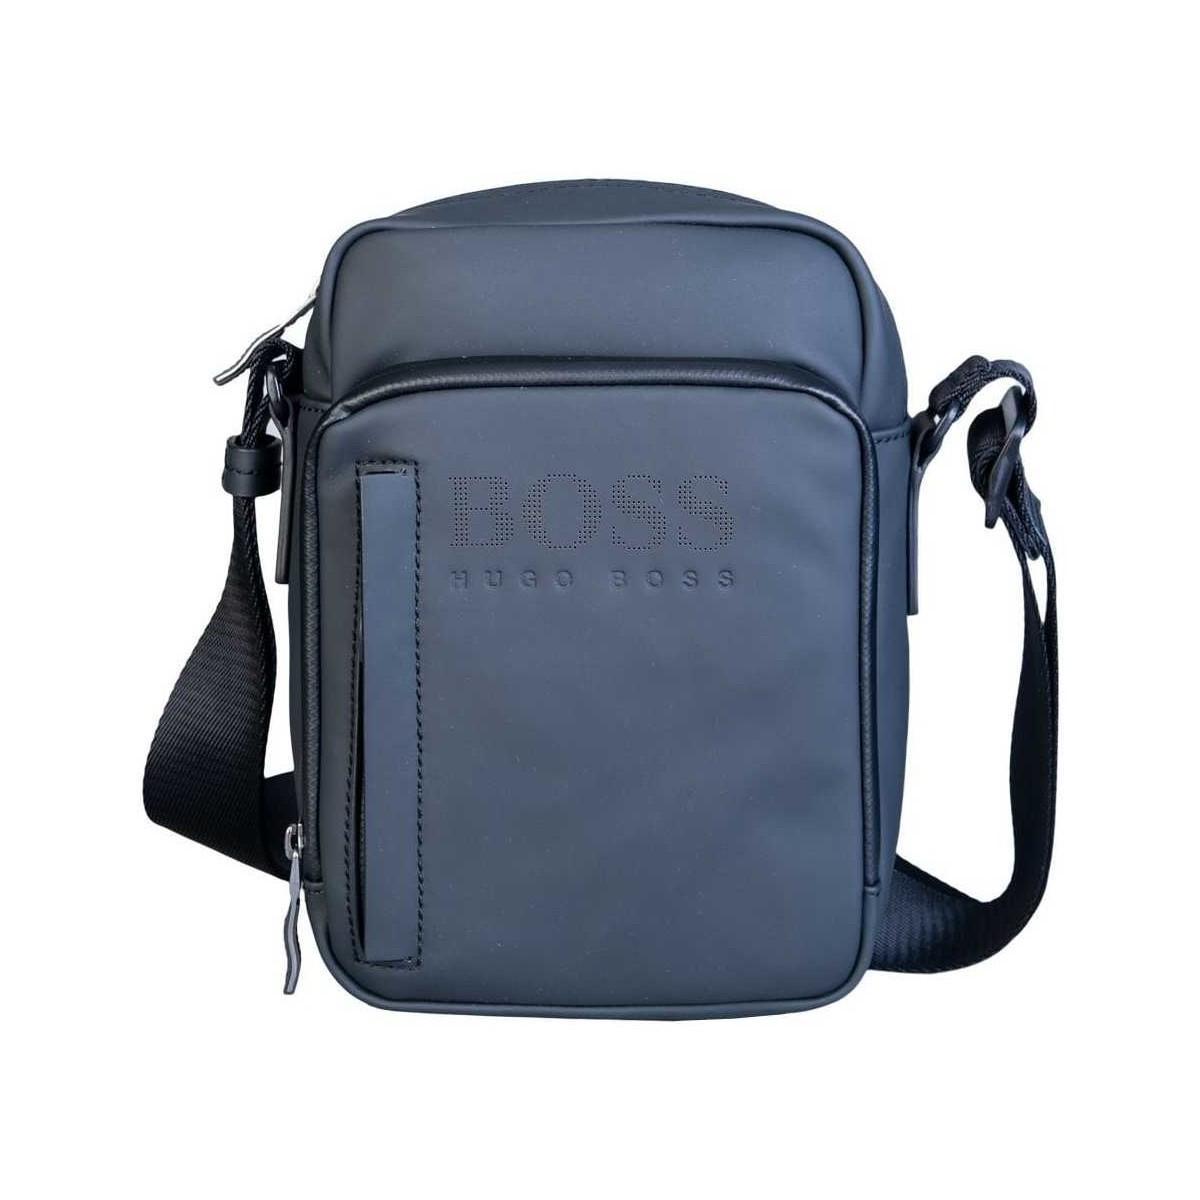 7aabead8dc BOSS Bag Messenger Model Quot;hyper Ns Zip 50397465 Quot; Men's ...